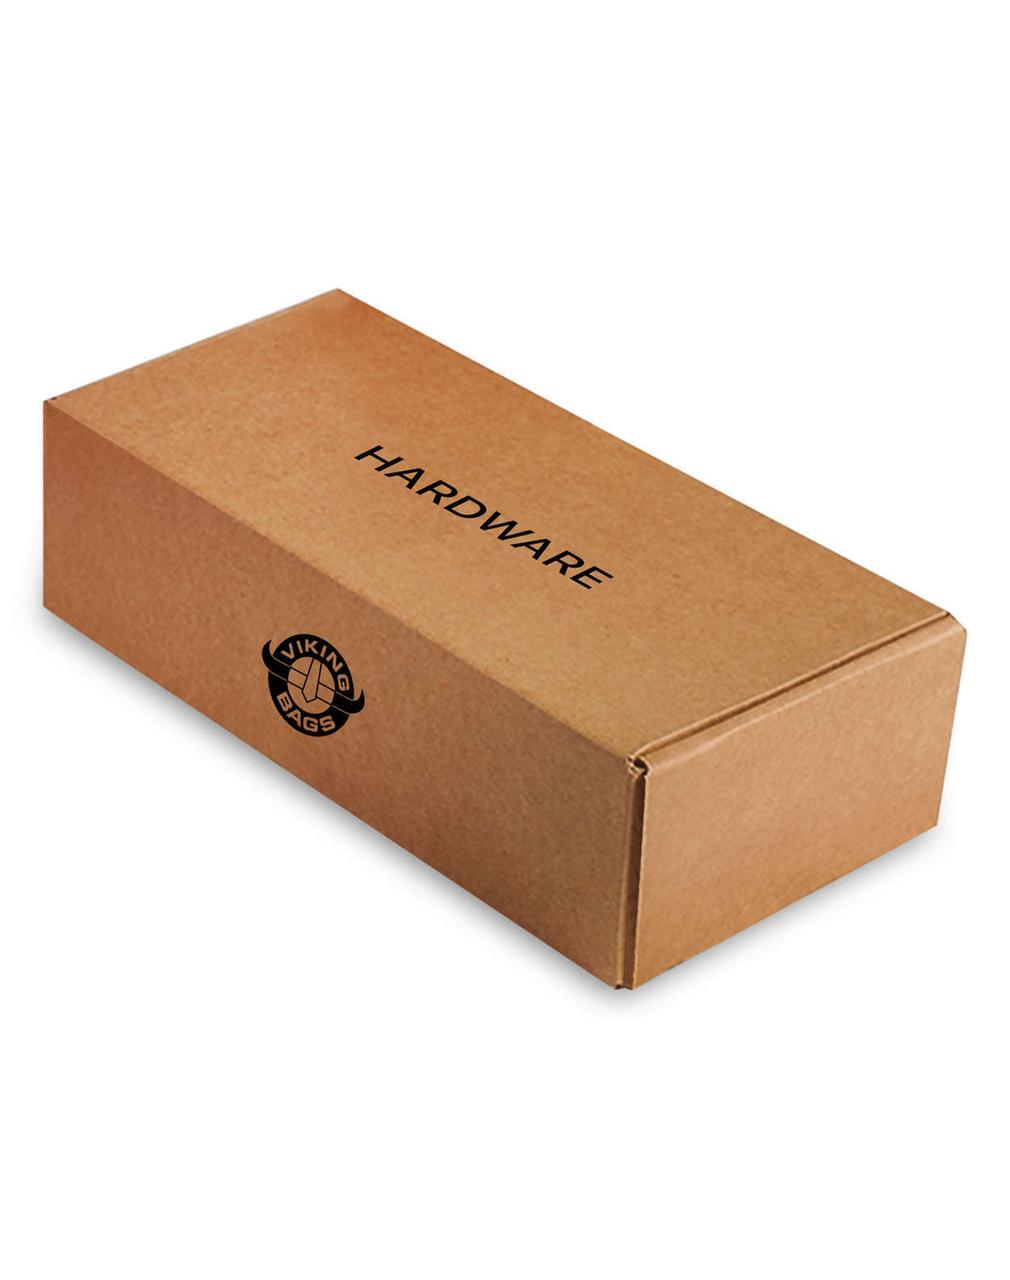 Triumph Thunderbird Viking Charger Side Pocket With Shock Cutout Motorcycle Saddlebags Box